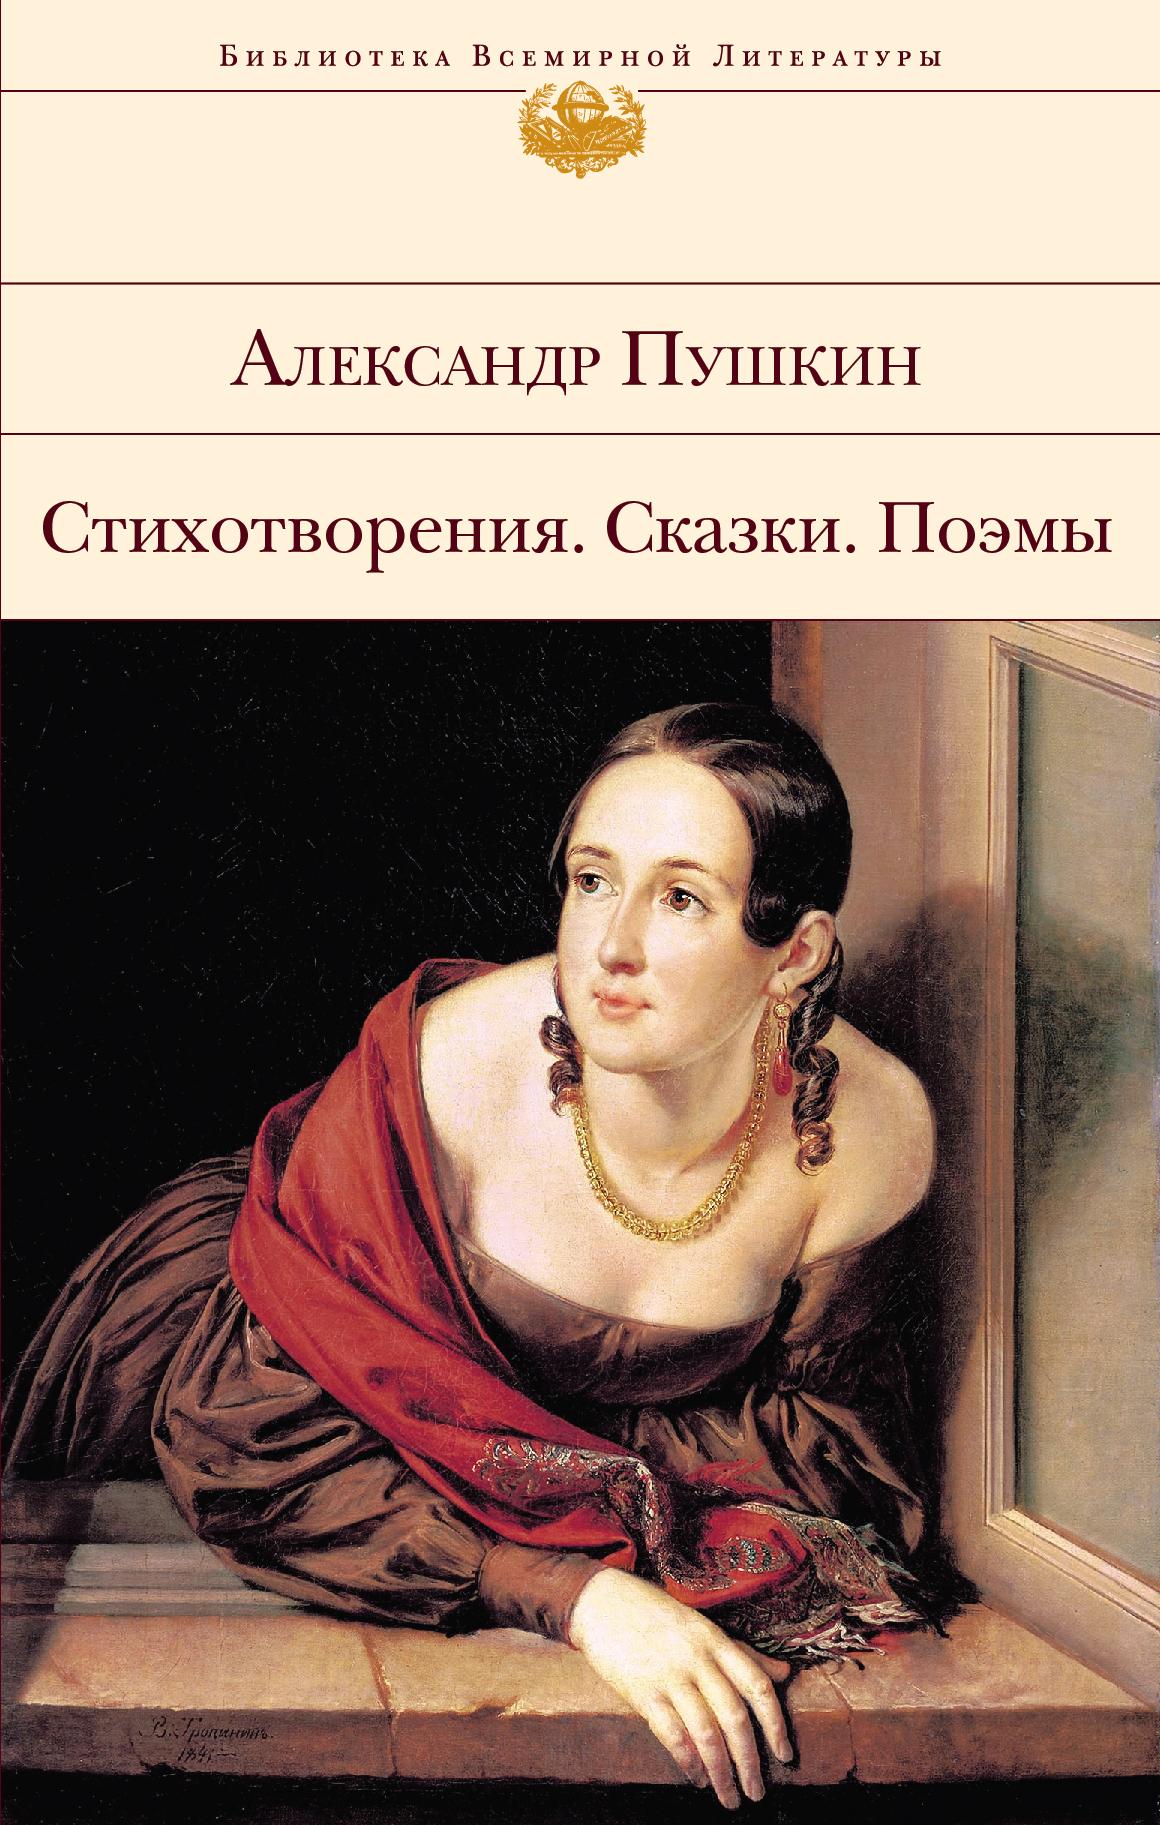 Александр Пушкин. Стихотворения. Сказки. Поэмы